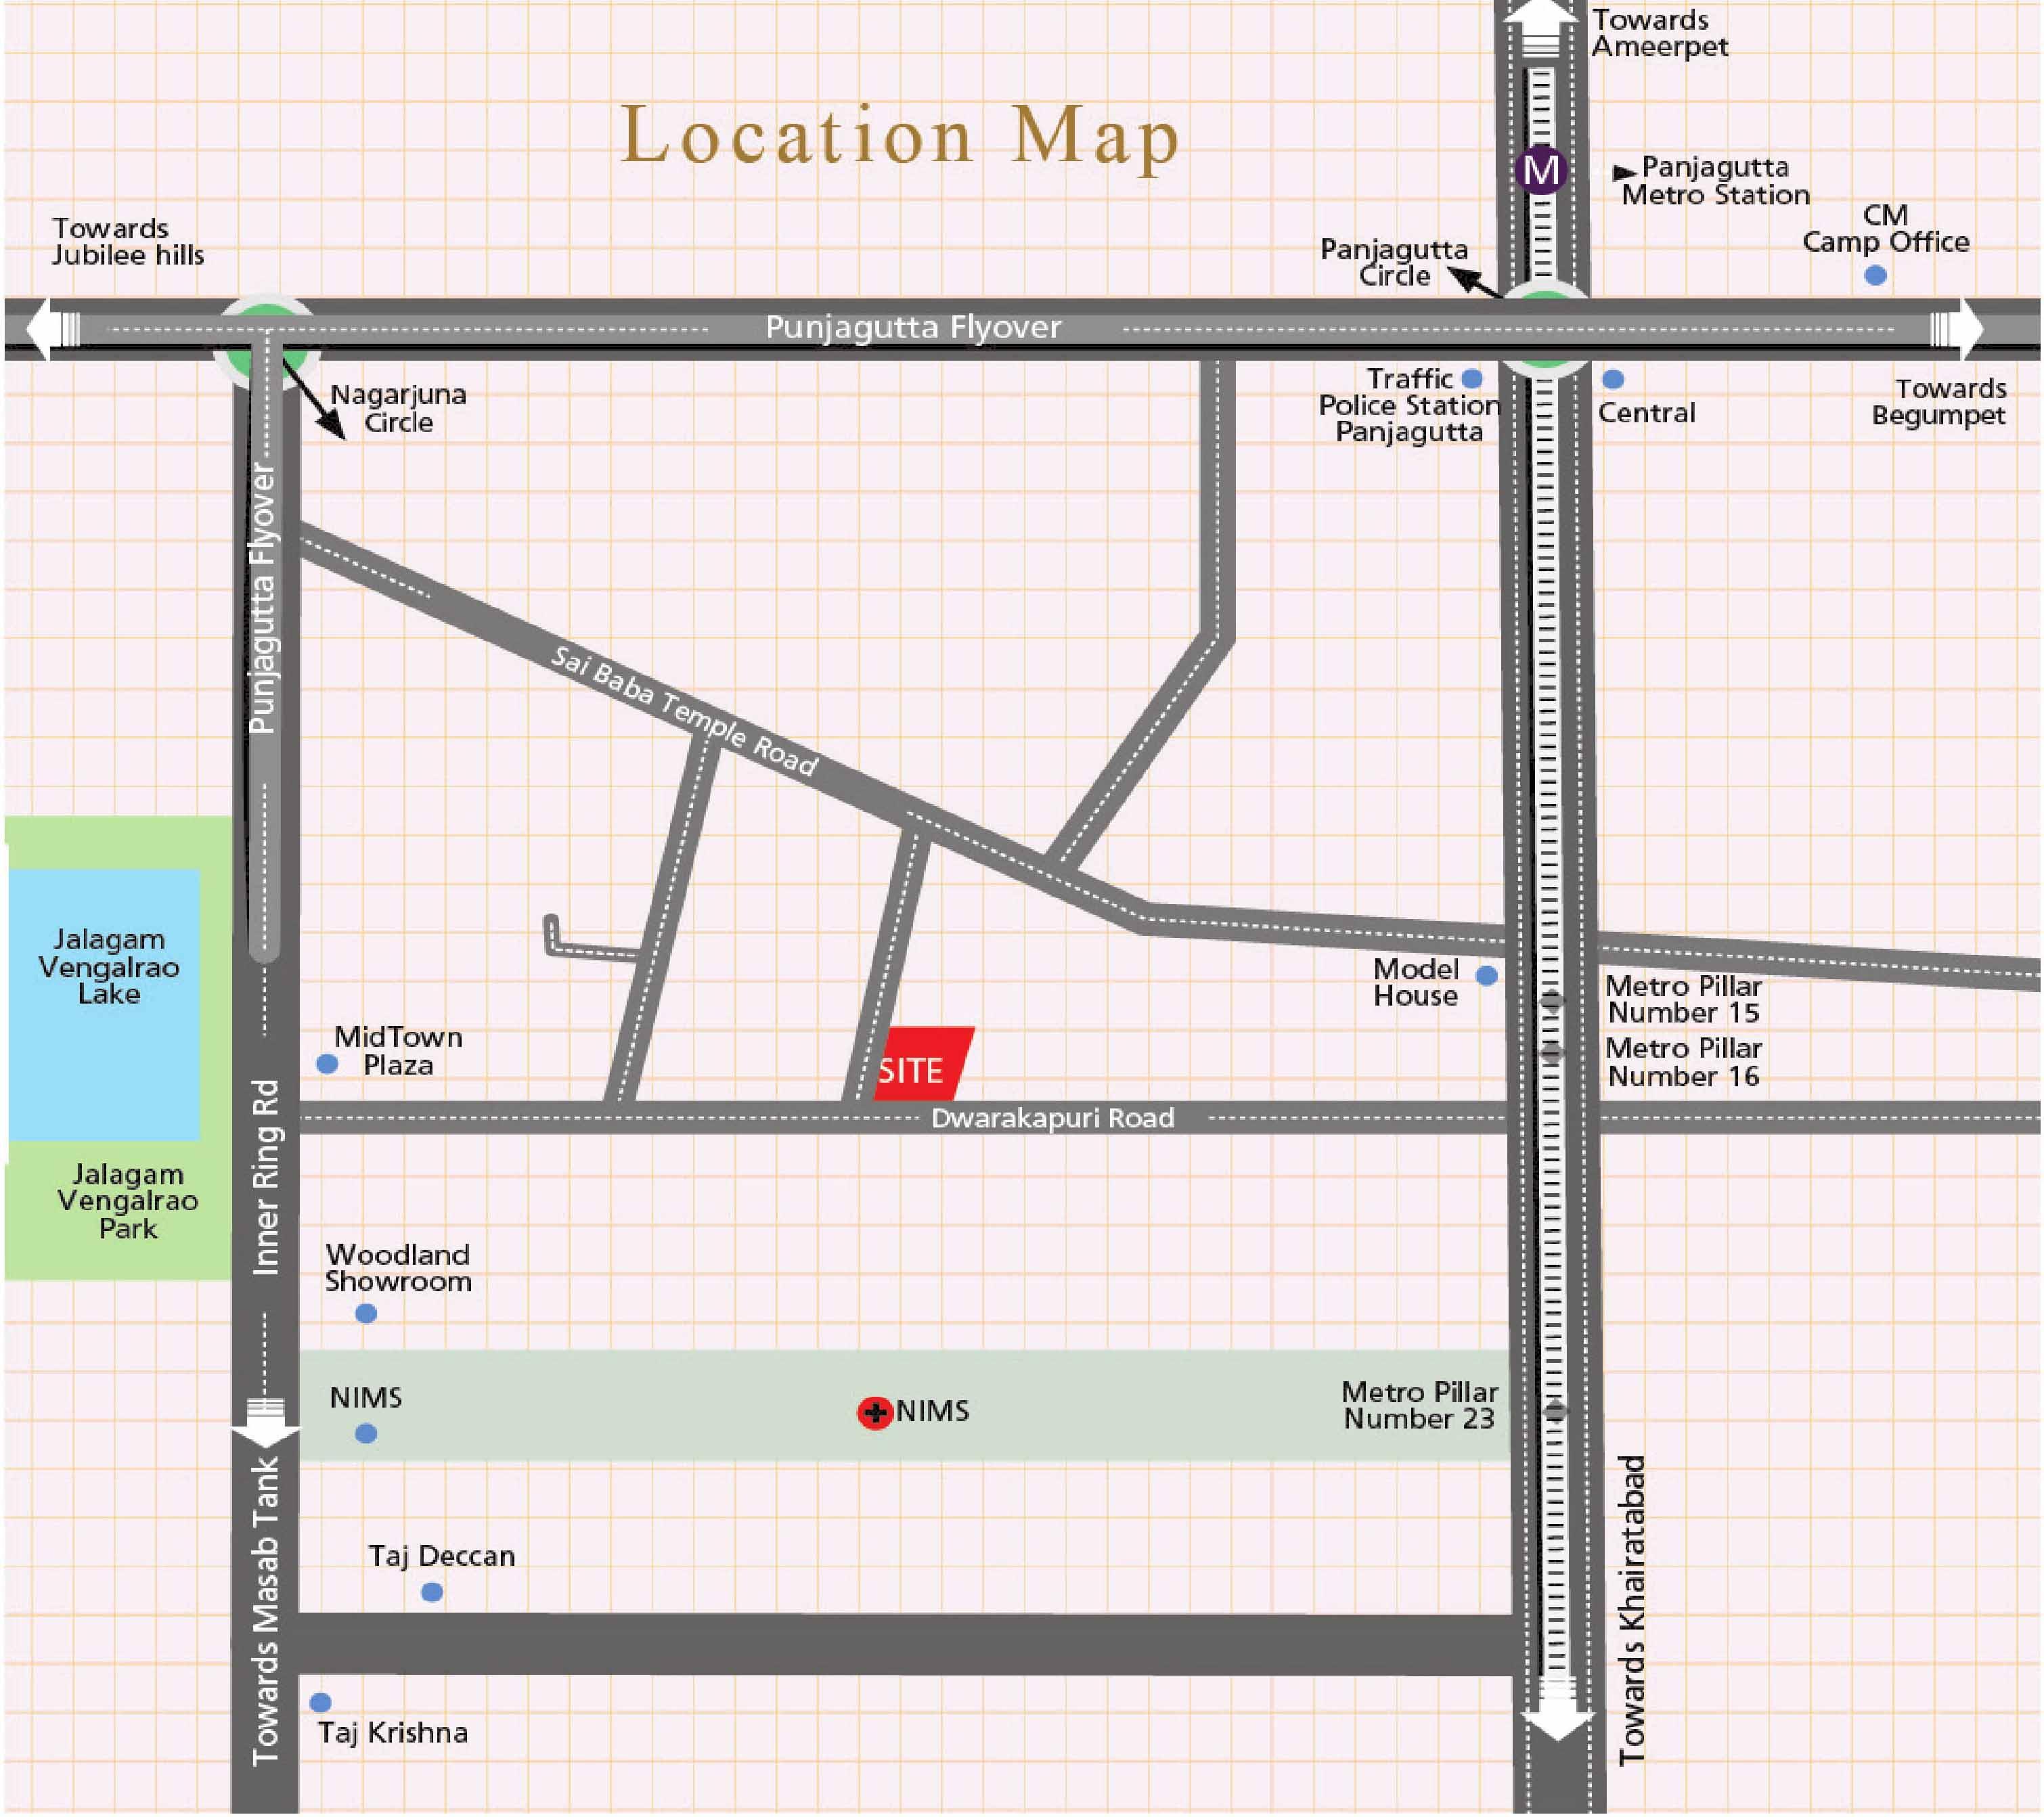 doyen crest project location image1